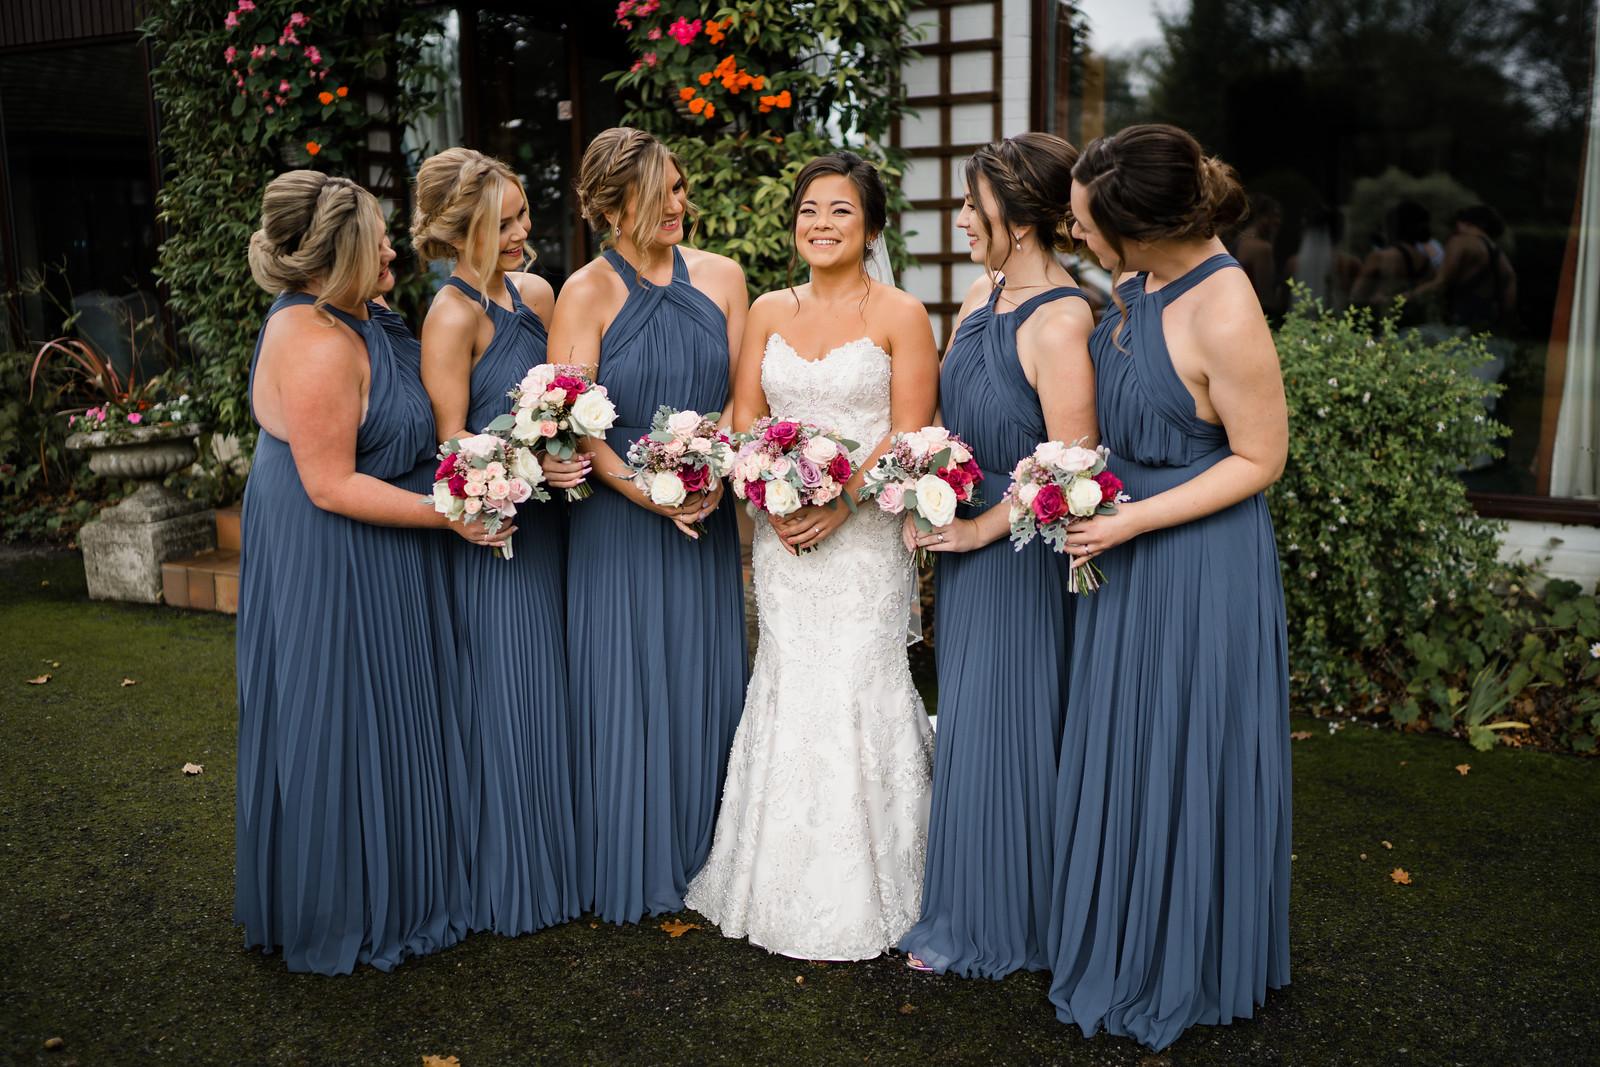 Bridesmaid wedding photo